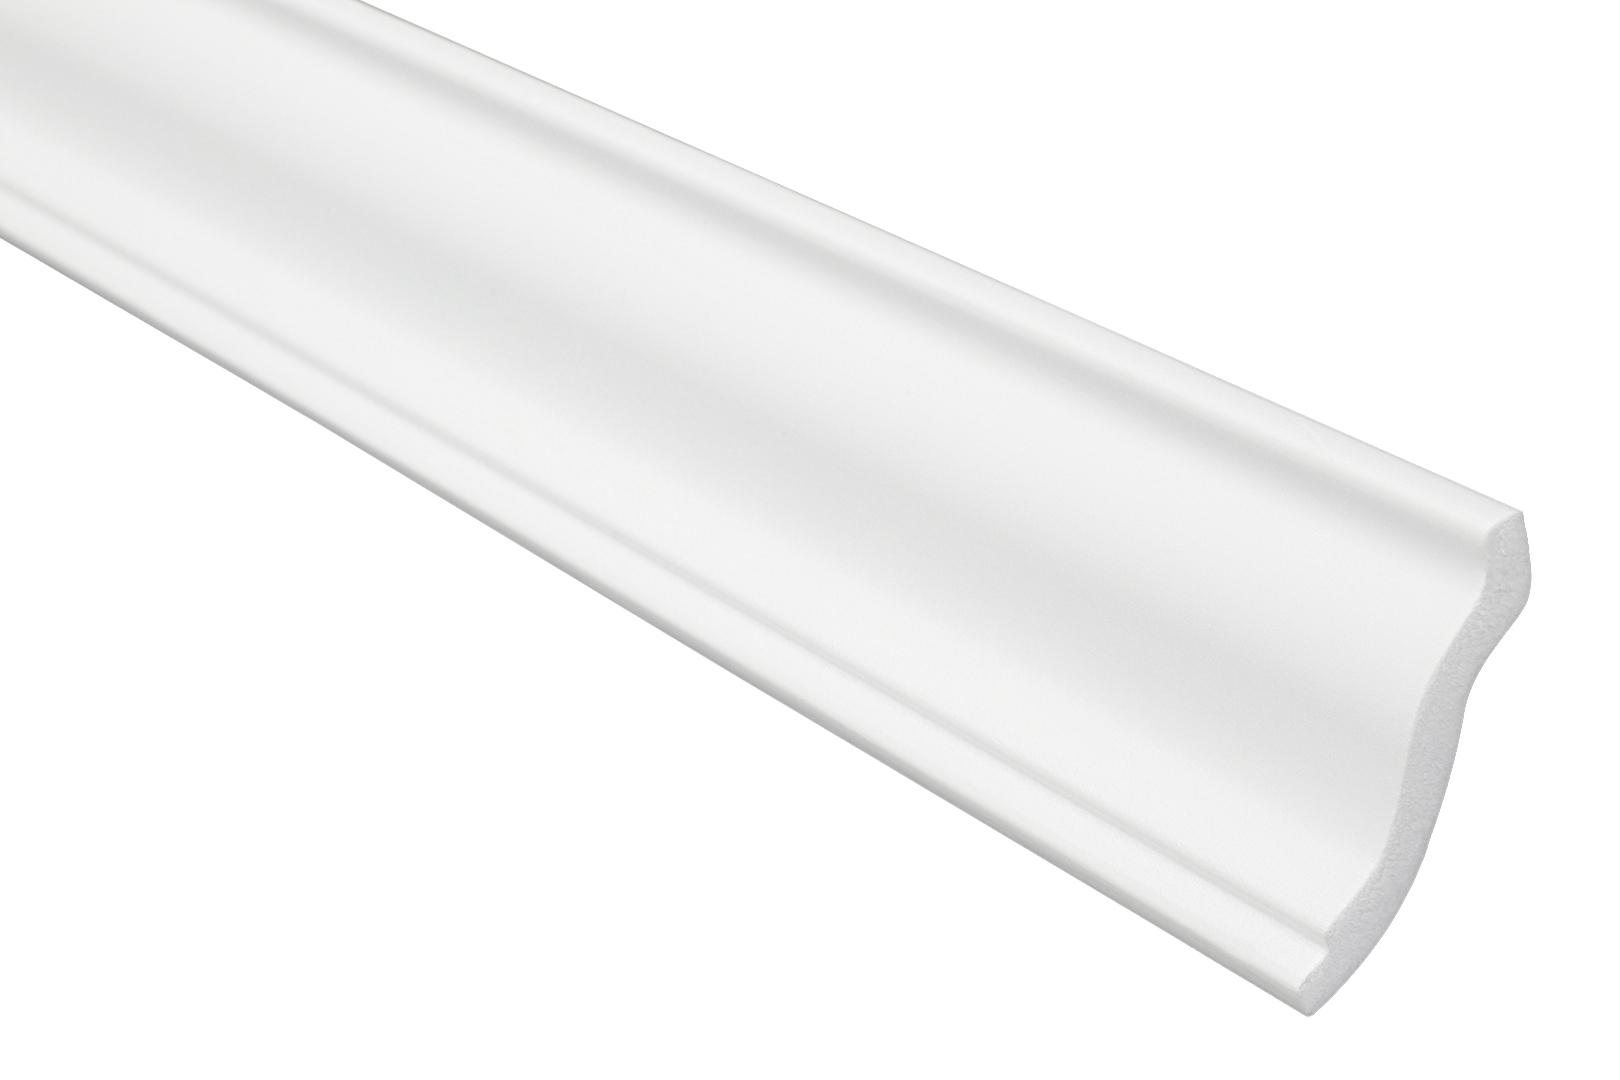 Stuckleiste Zierprofil | XPS | hart | Decora | 45x40mm |DI40